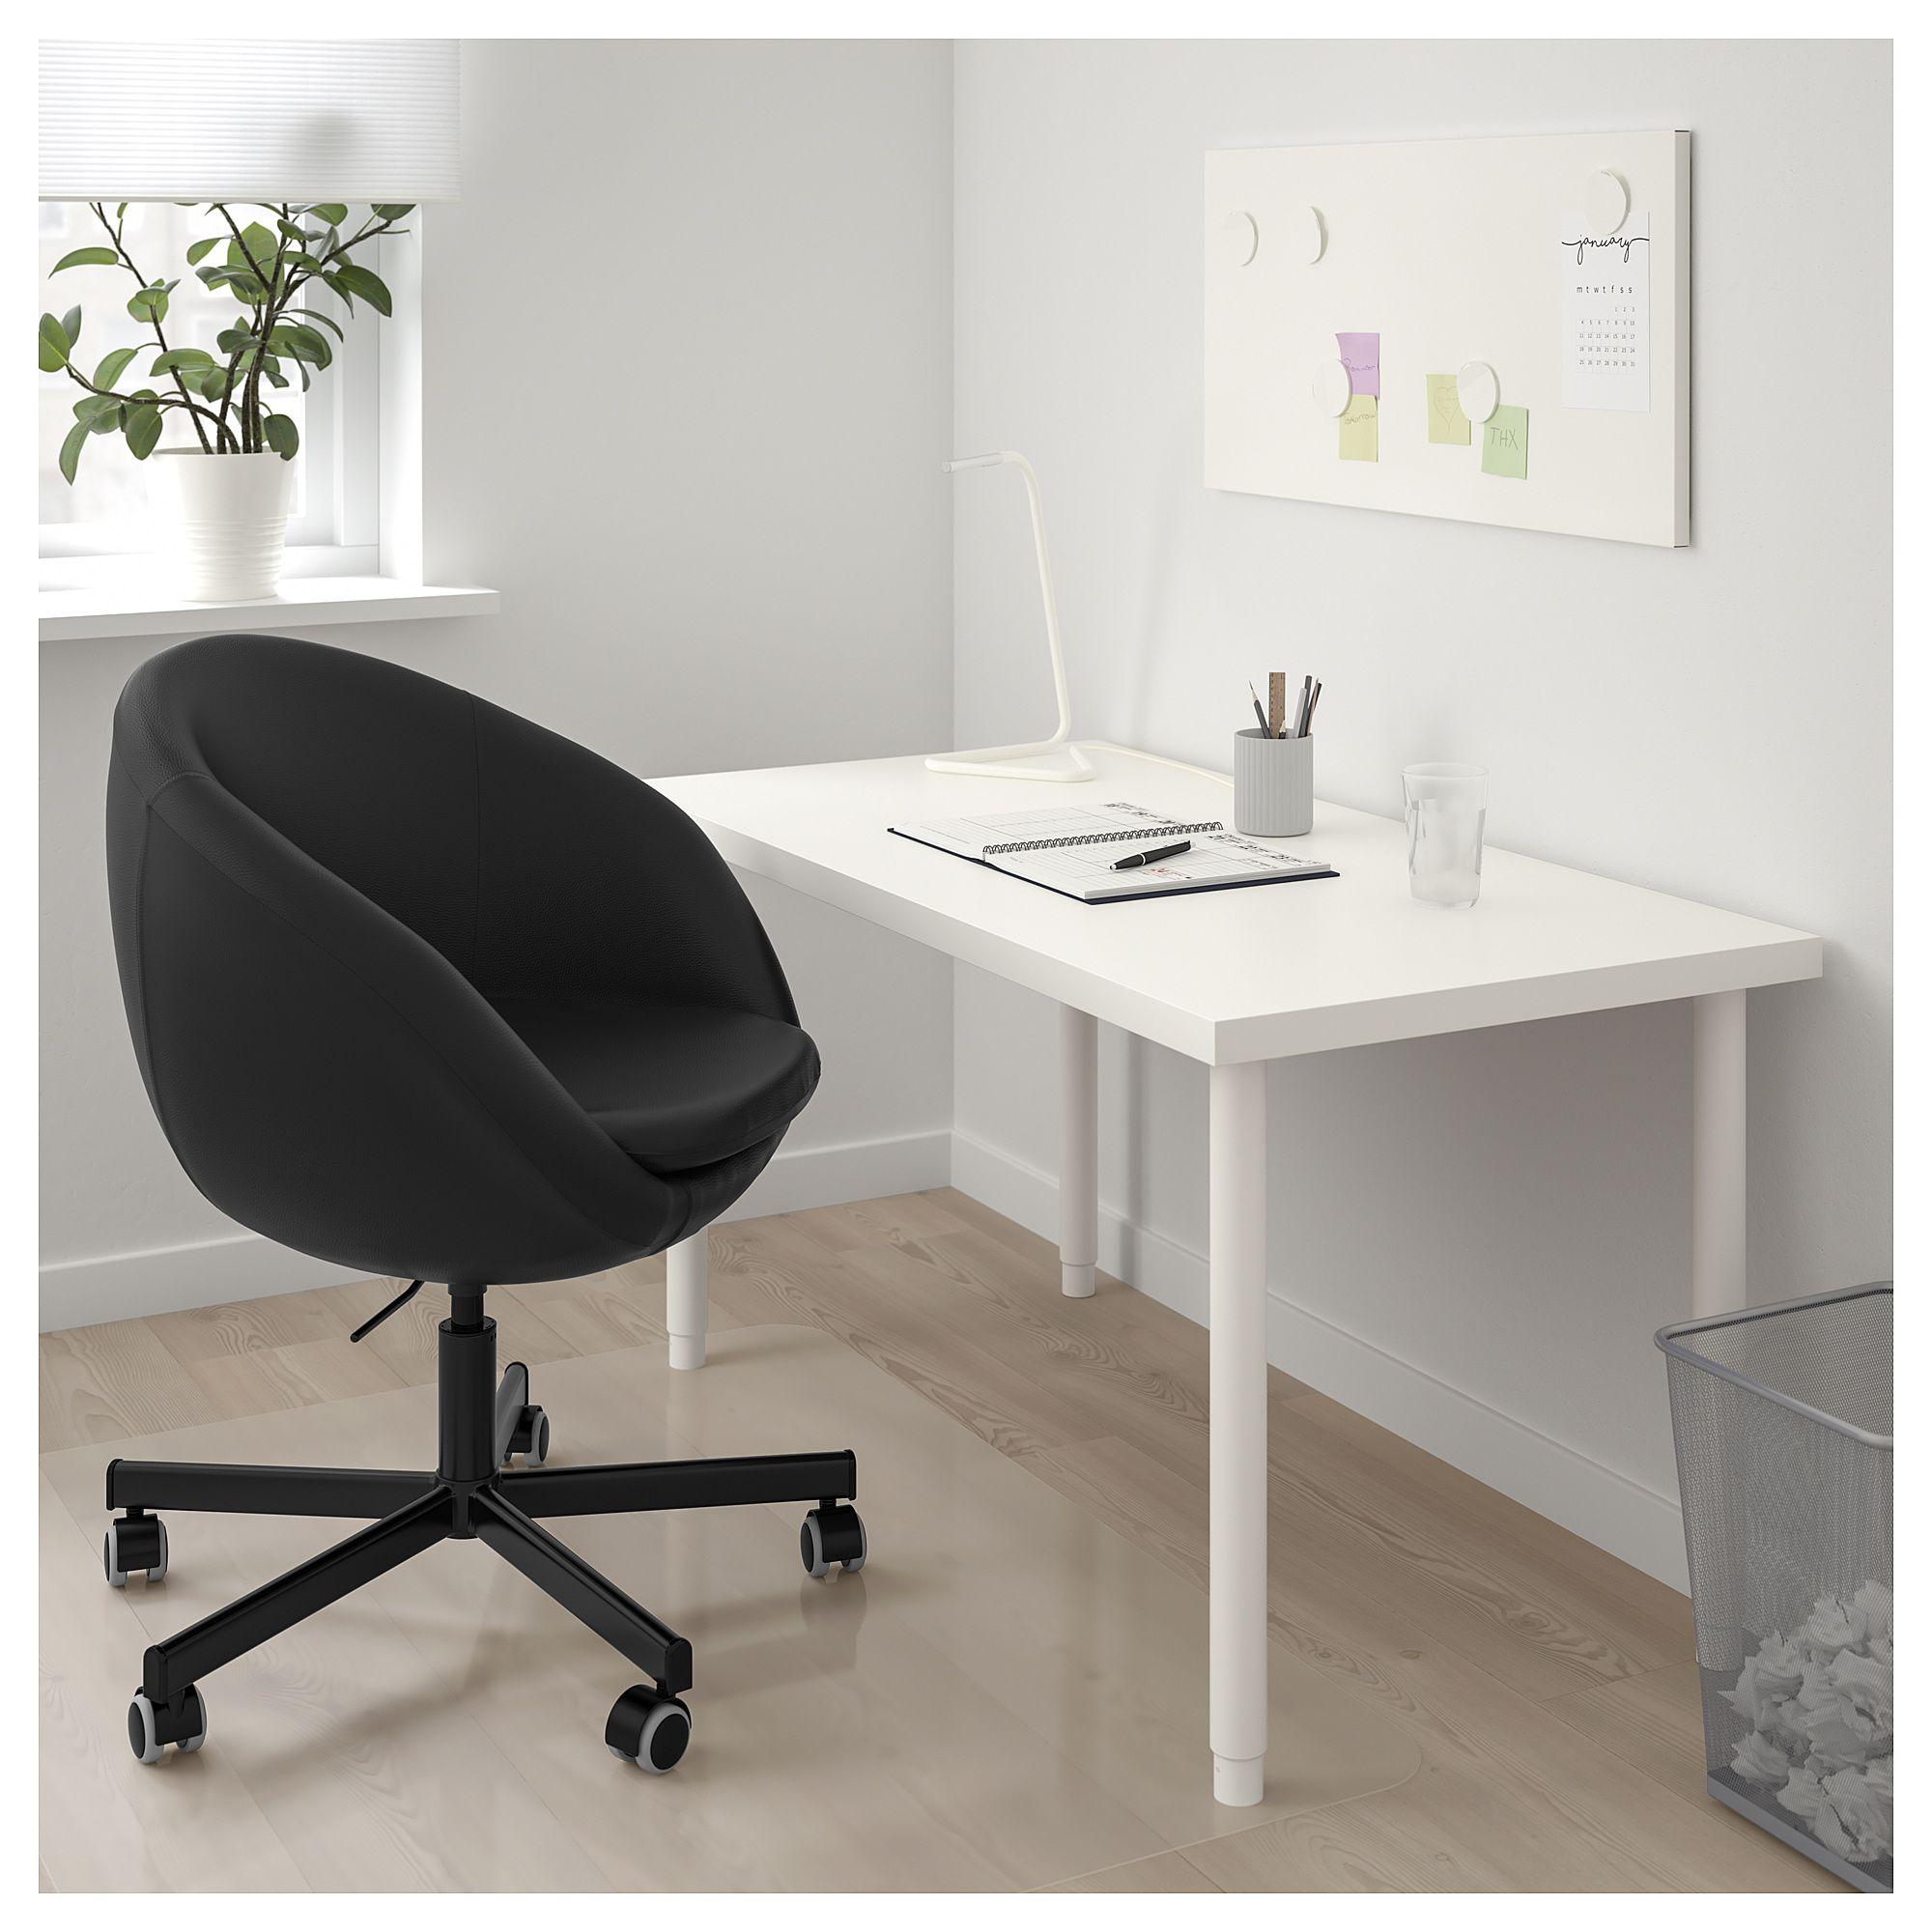 IKEA SKRUVSTA Swivel chair Idhult black in 2019 Swivel